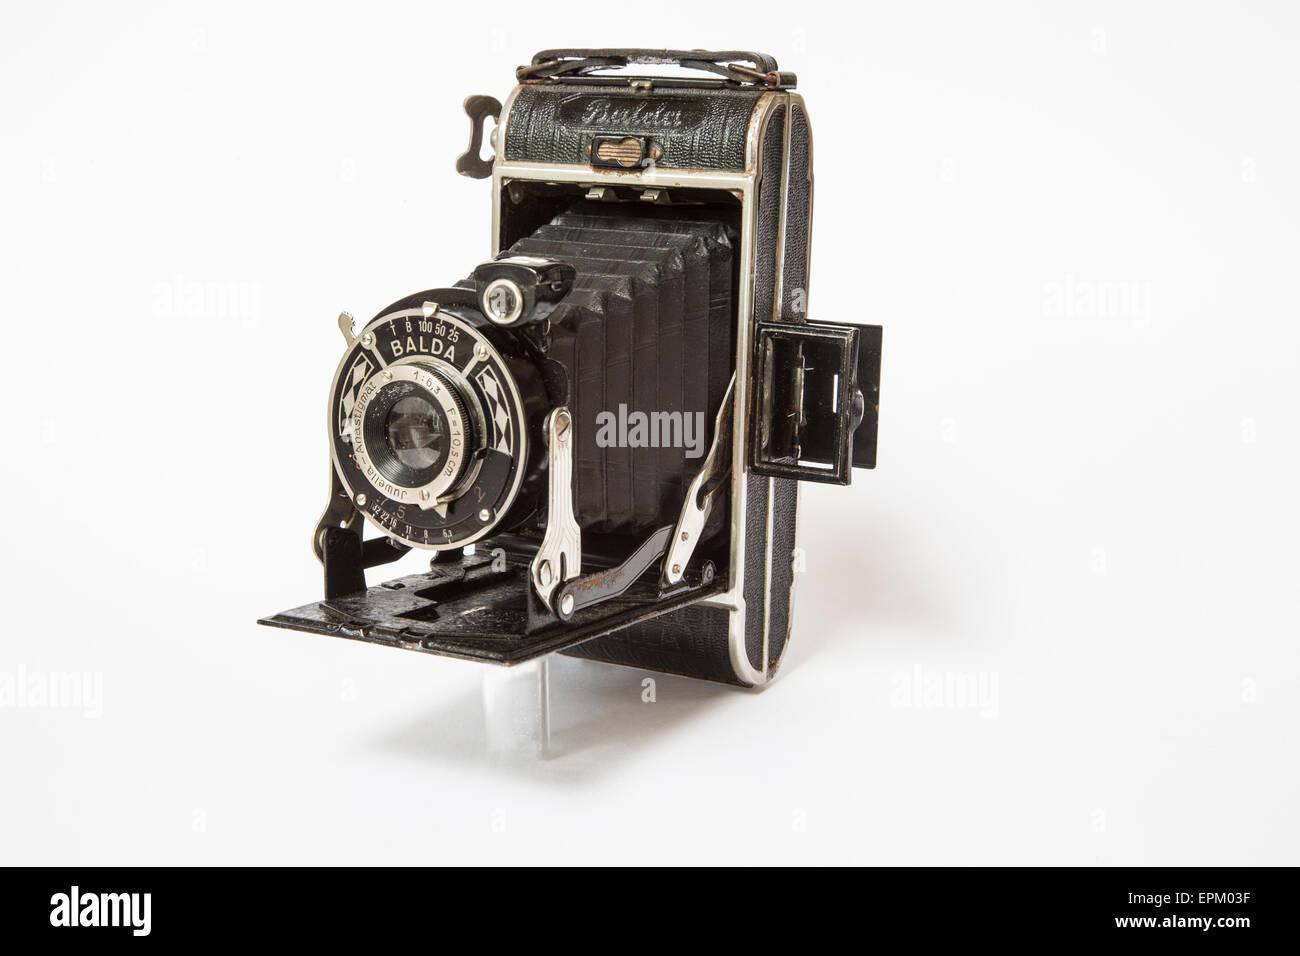 Balda Juwella German folding camera with bellows circa 1930 producing 6cm x 9cm images on 120 format film. - Stock Image